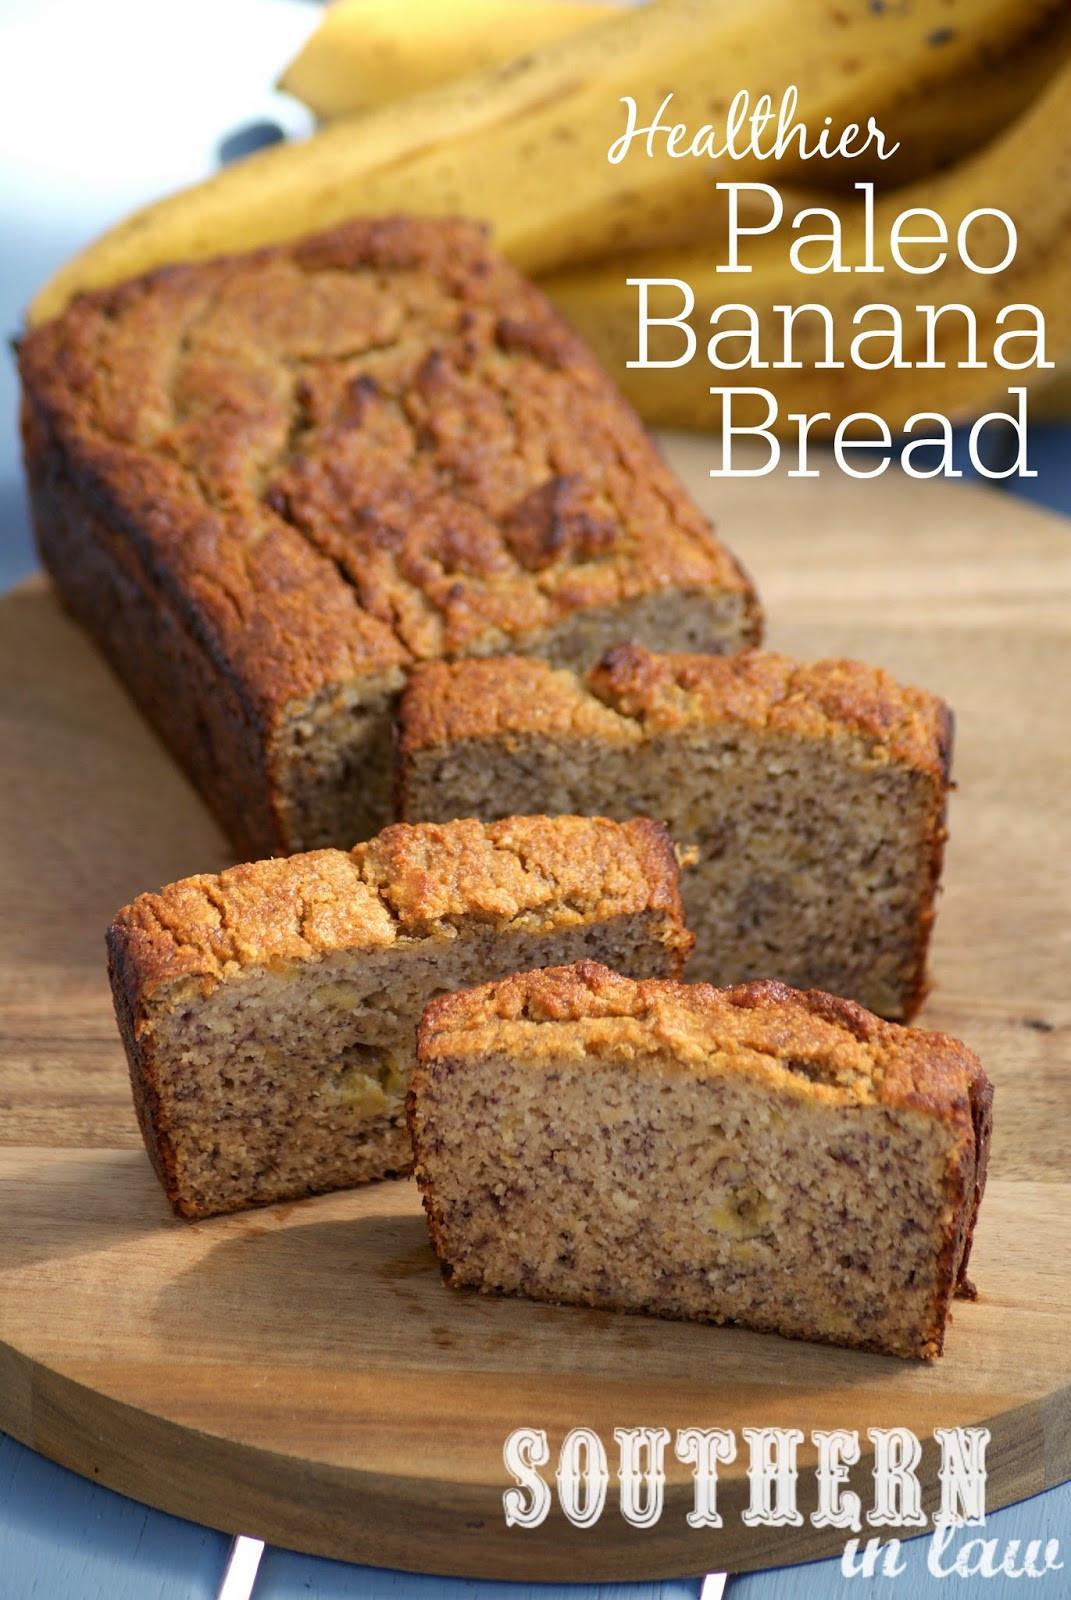 Best Healthy Banana Bread Recipe  Southern In Law Recipe The Best Healthy Paleo Banana Bread